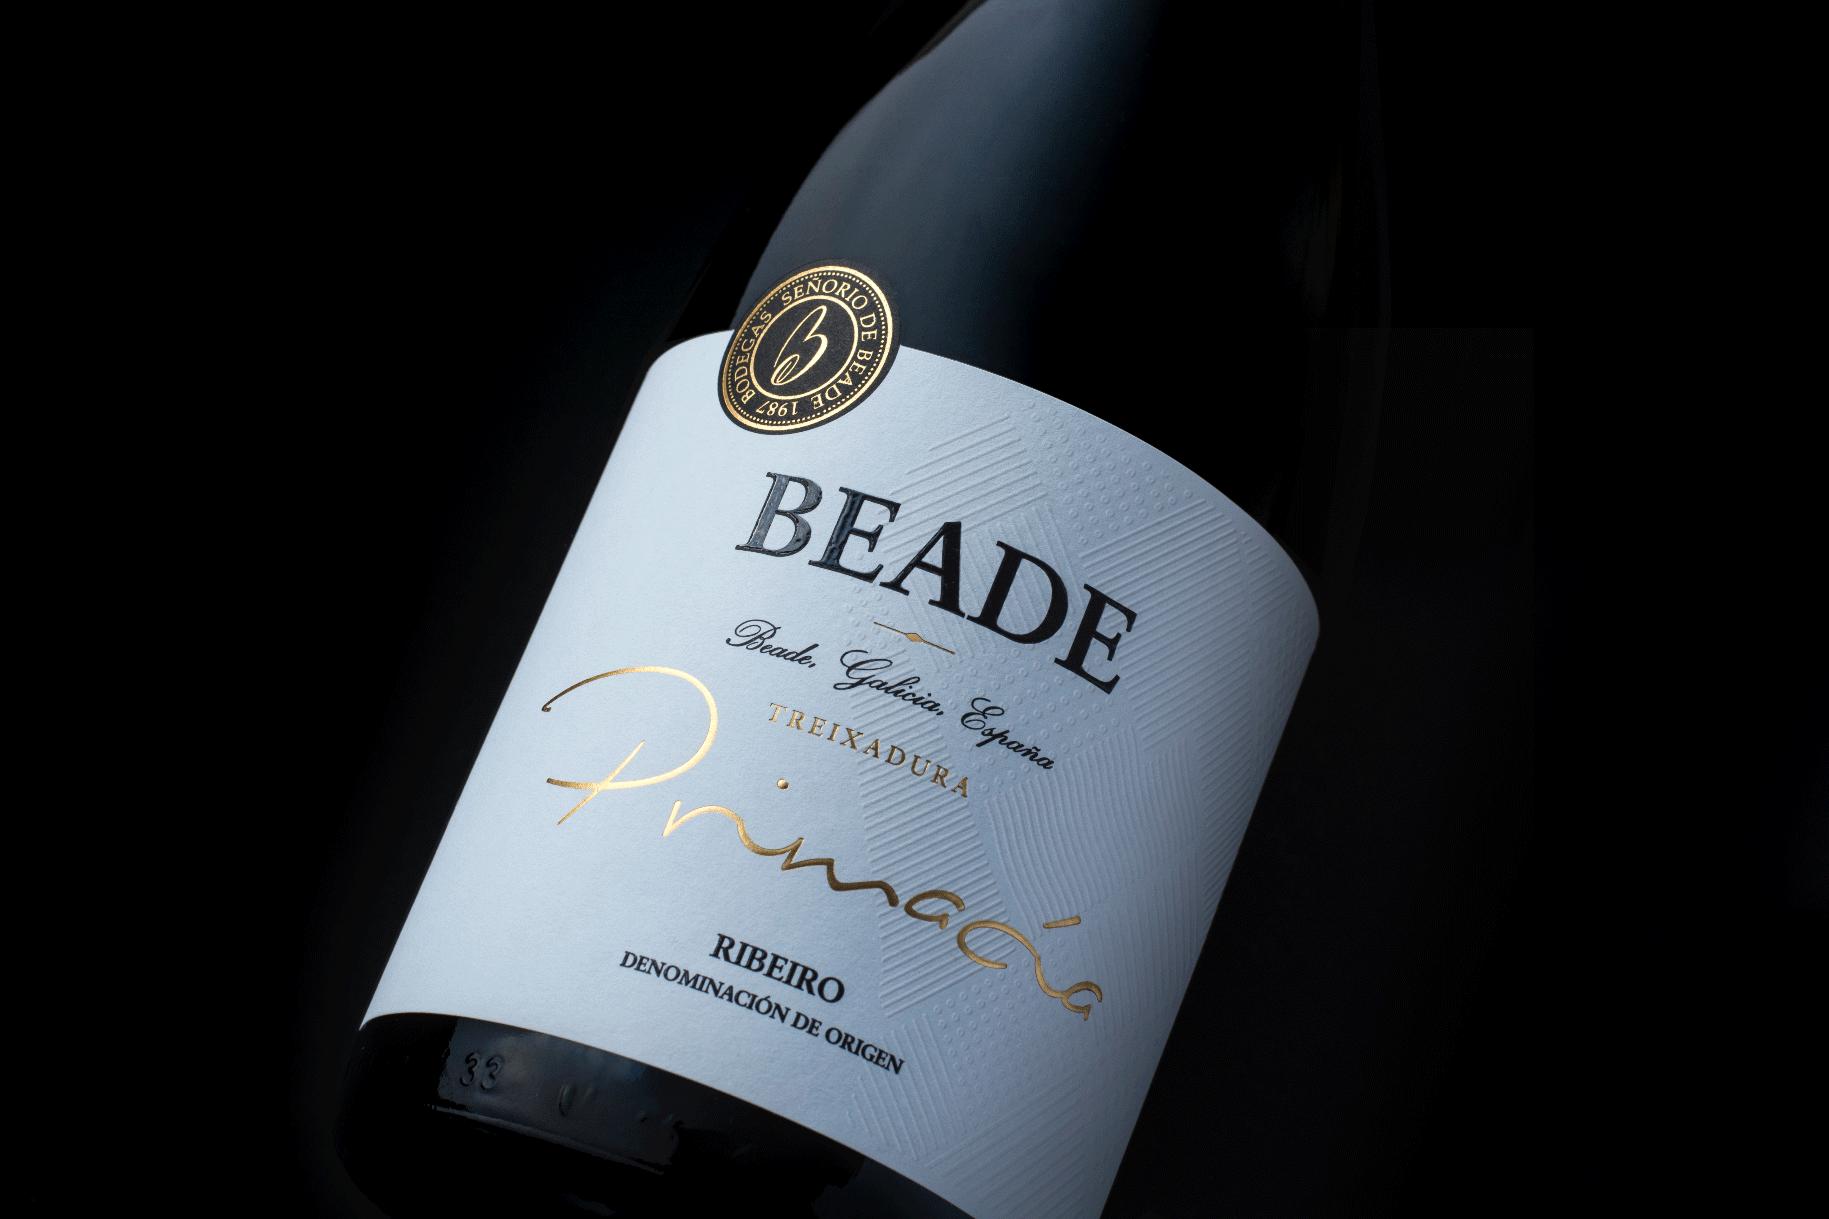 Diseño de etiqueta vino galicia